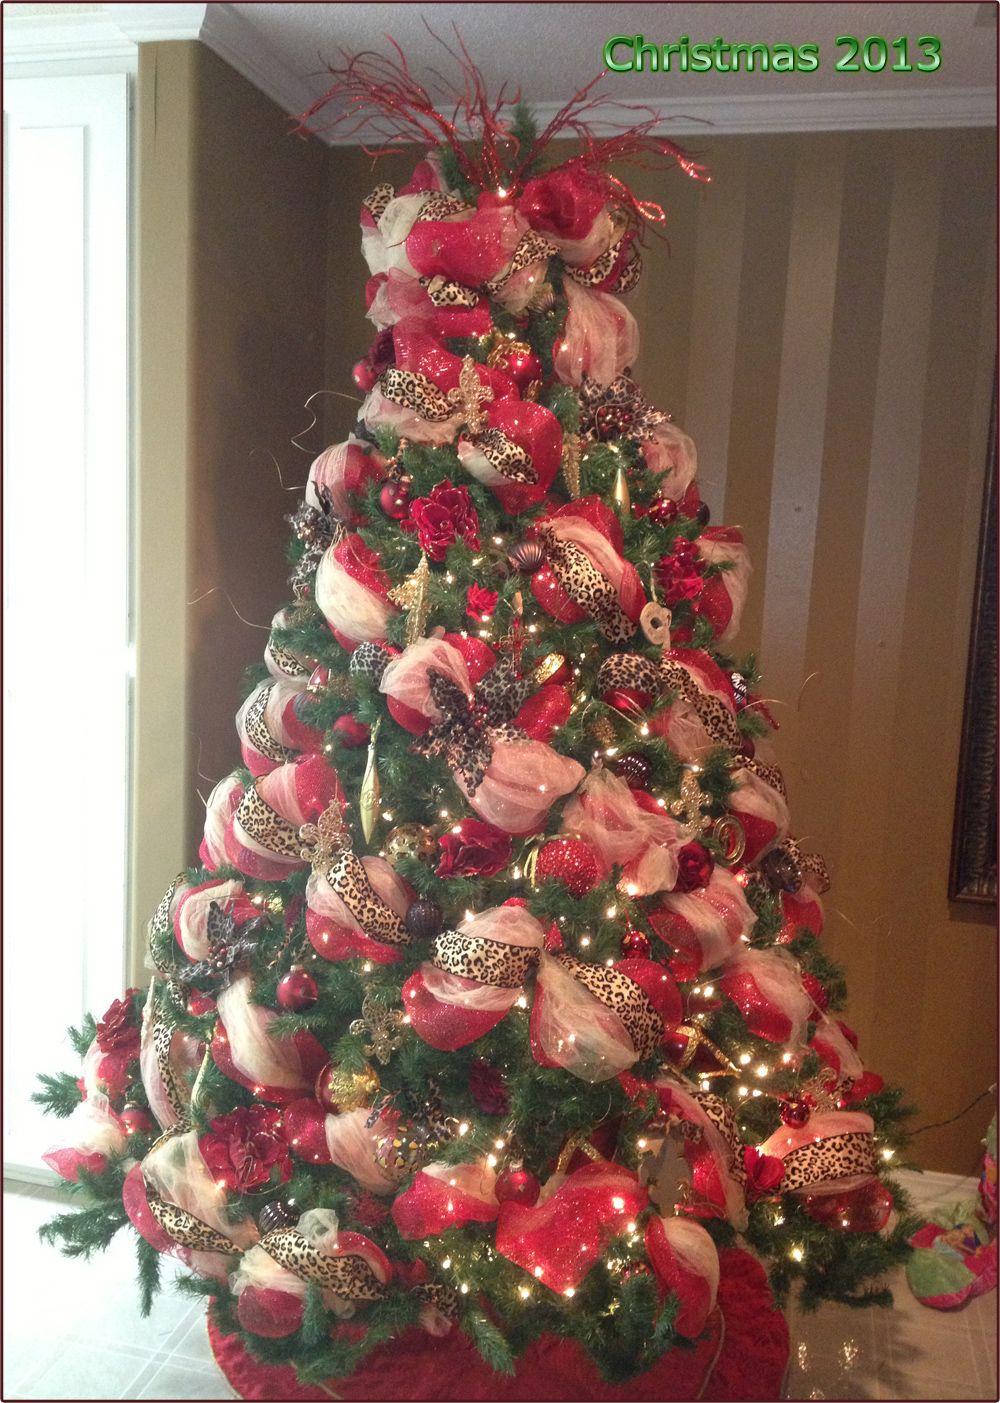 2012 Christmas Tree - LOVE THE BLING CHRISTMAS BRINGS!!